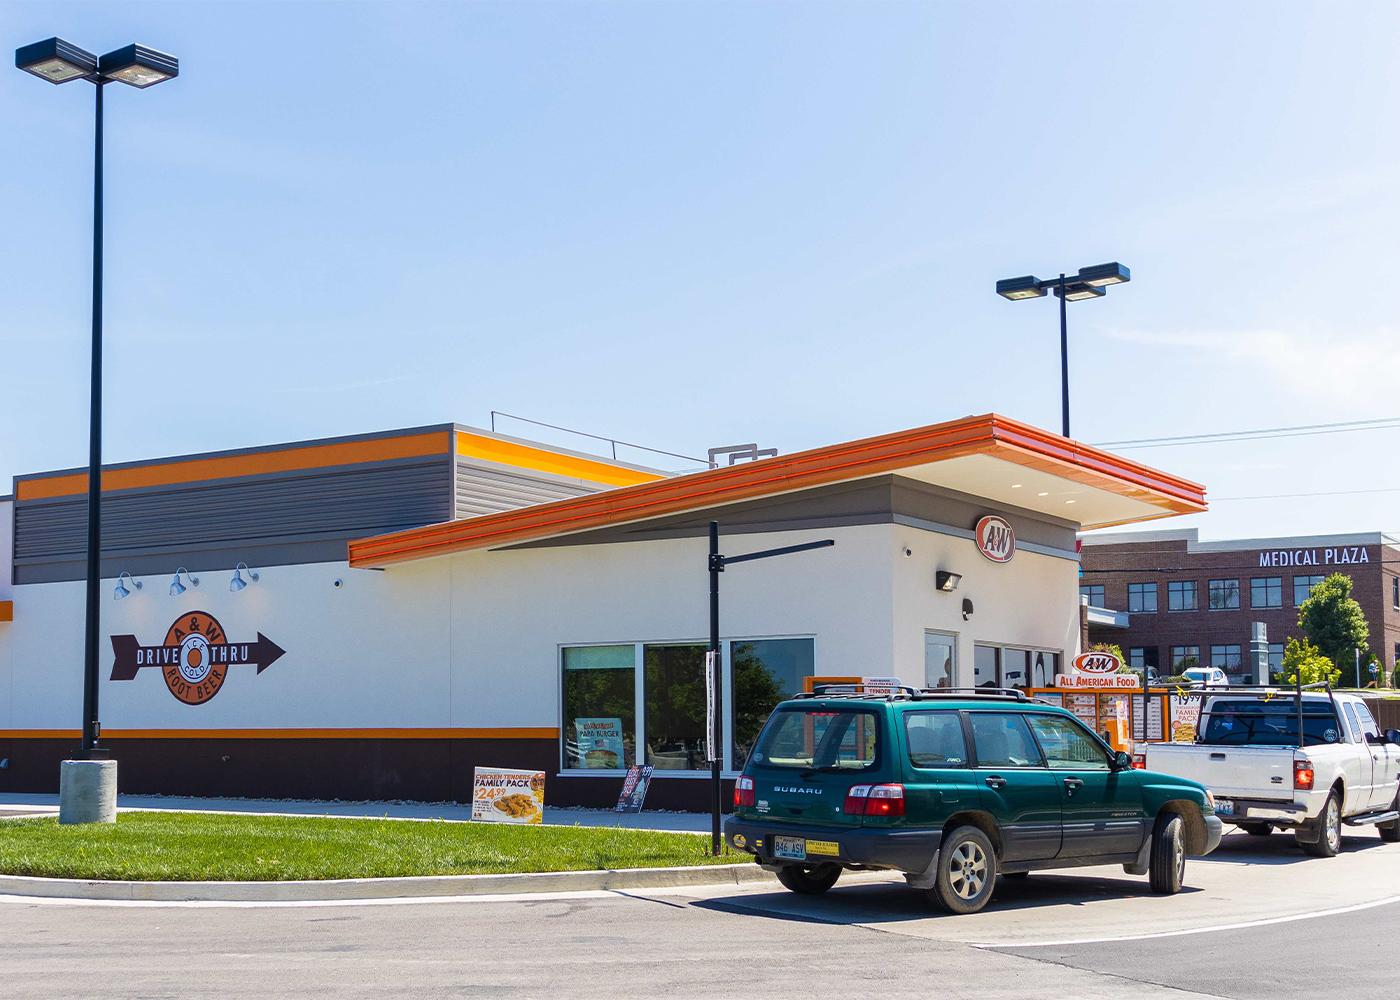 Photo of A&W Restaurant drive-thru in Richmond, KY.